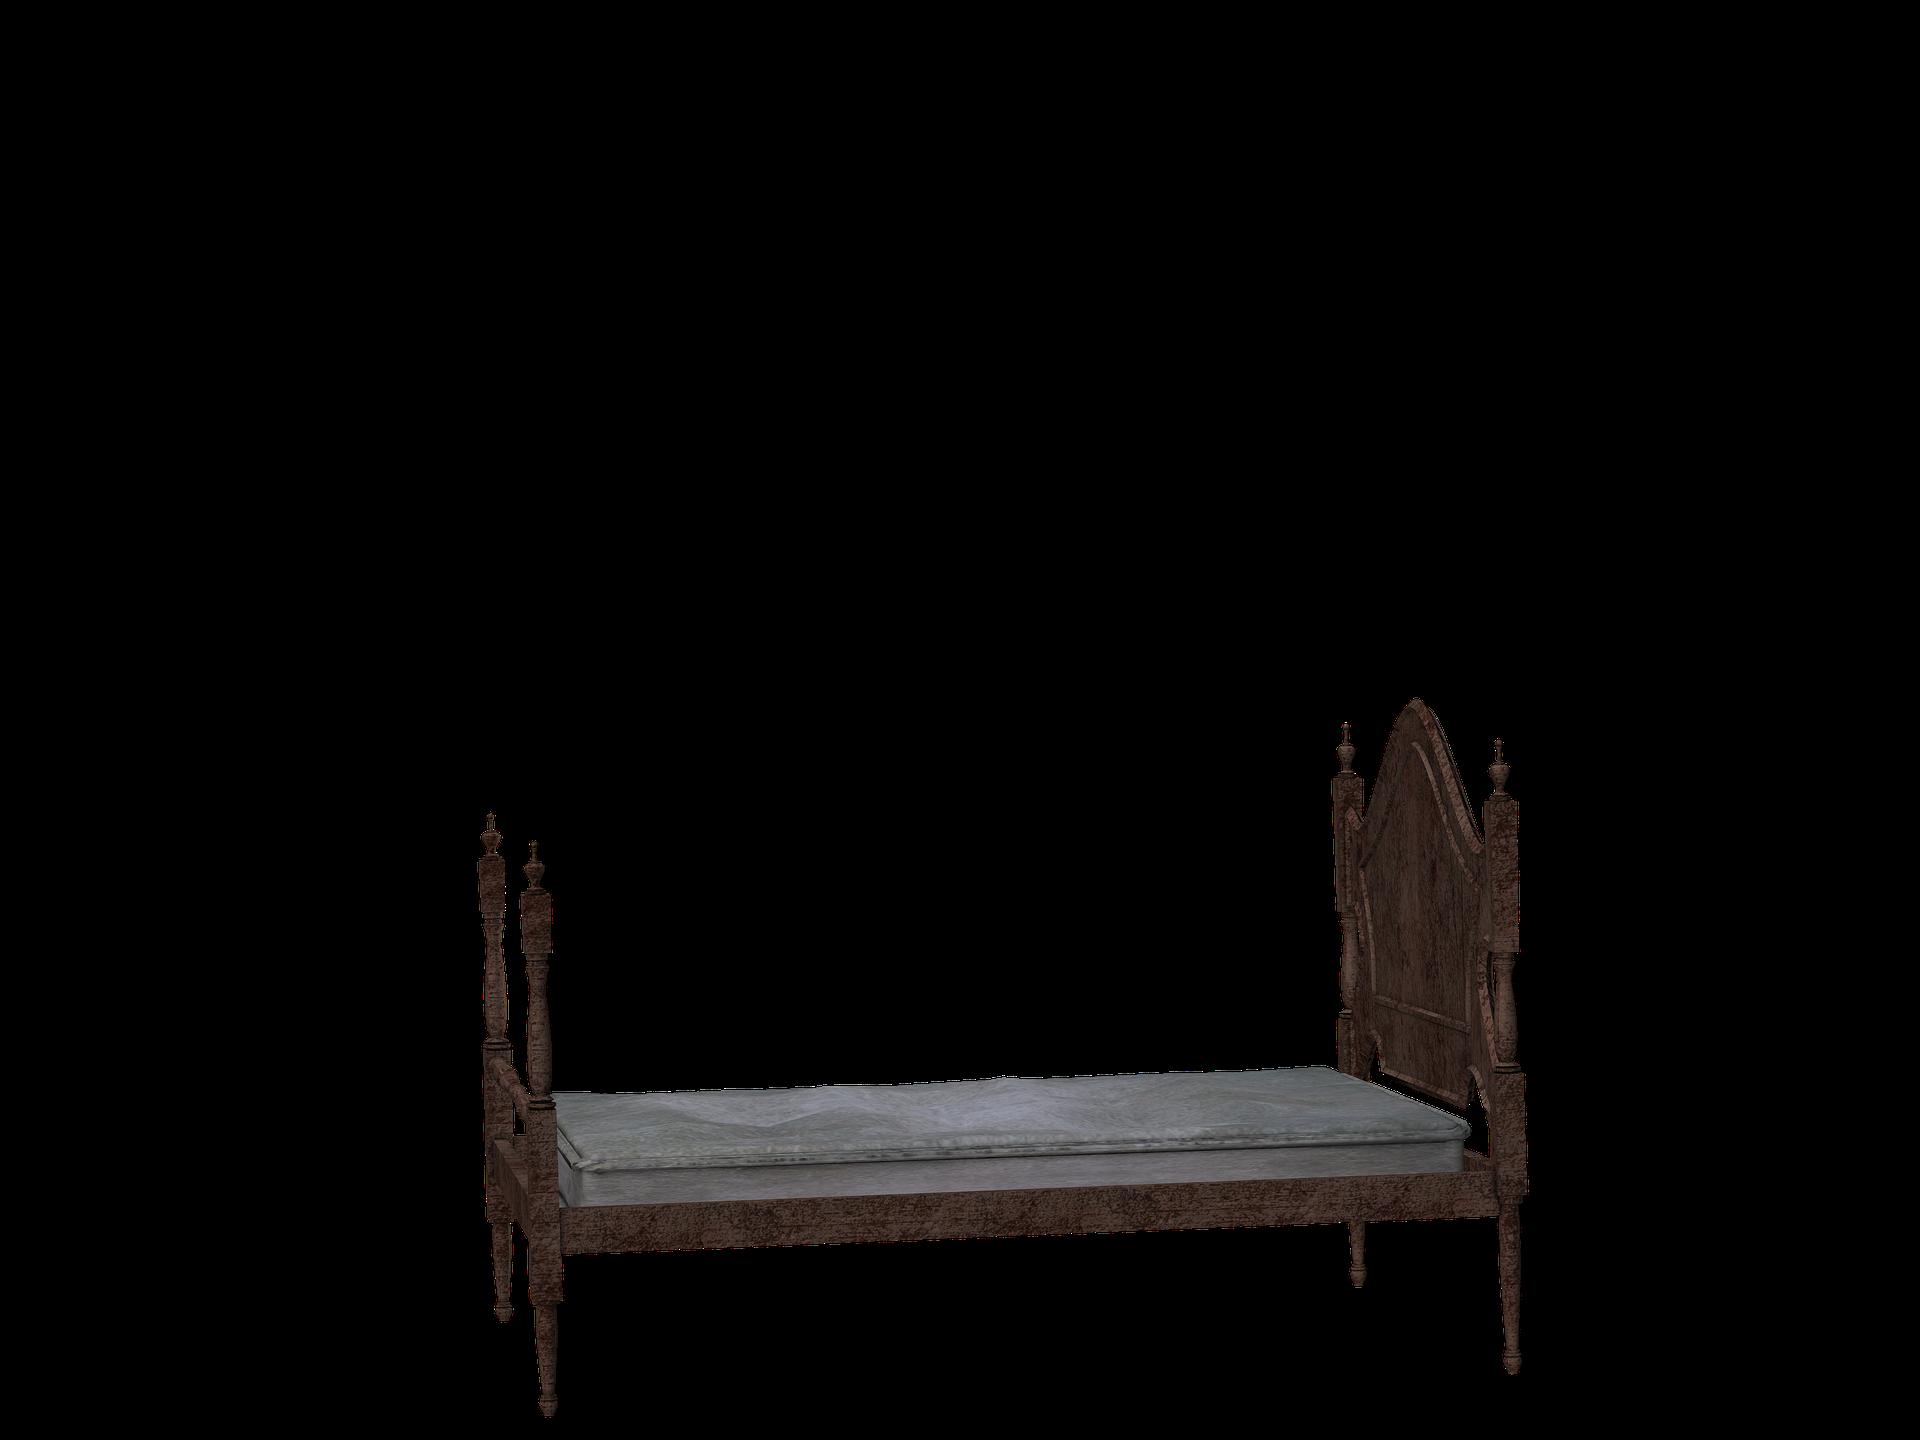 Spí sa vám dobre?